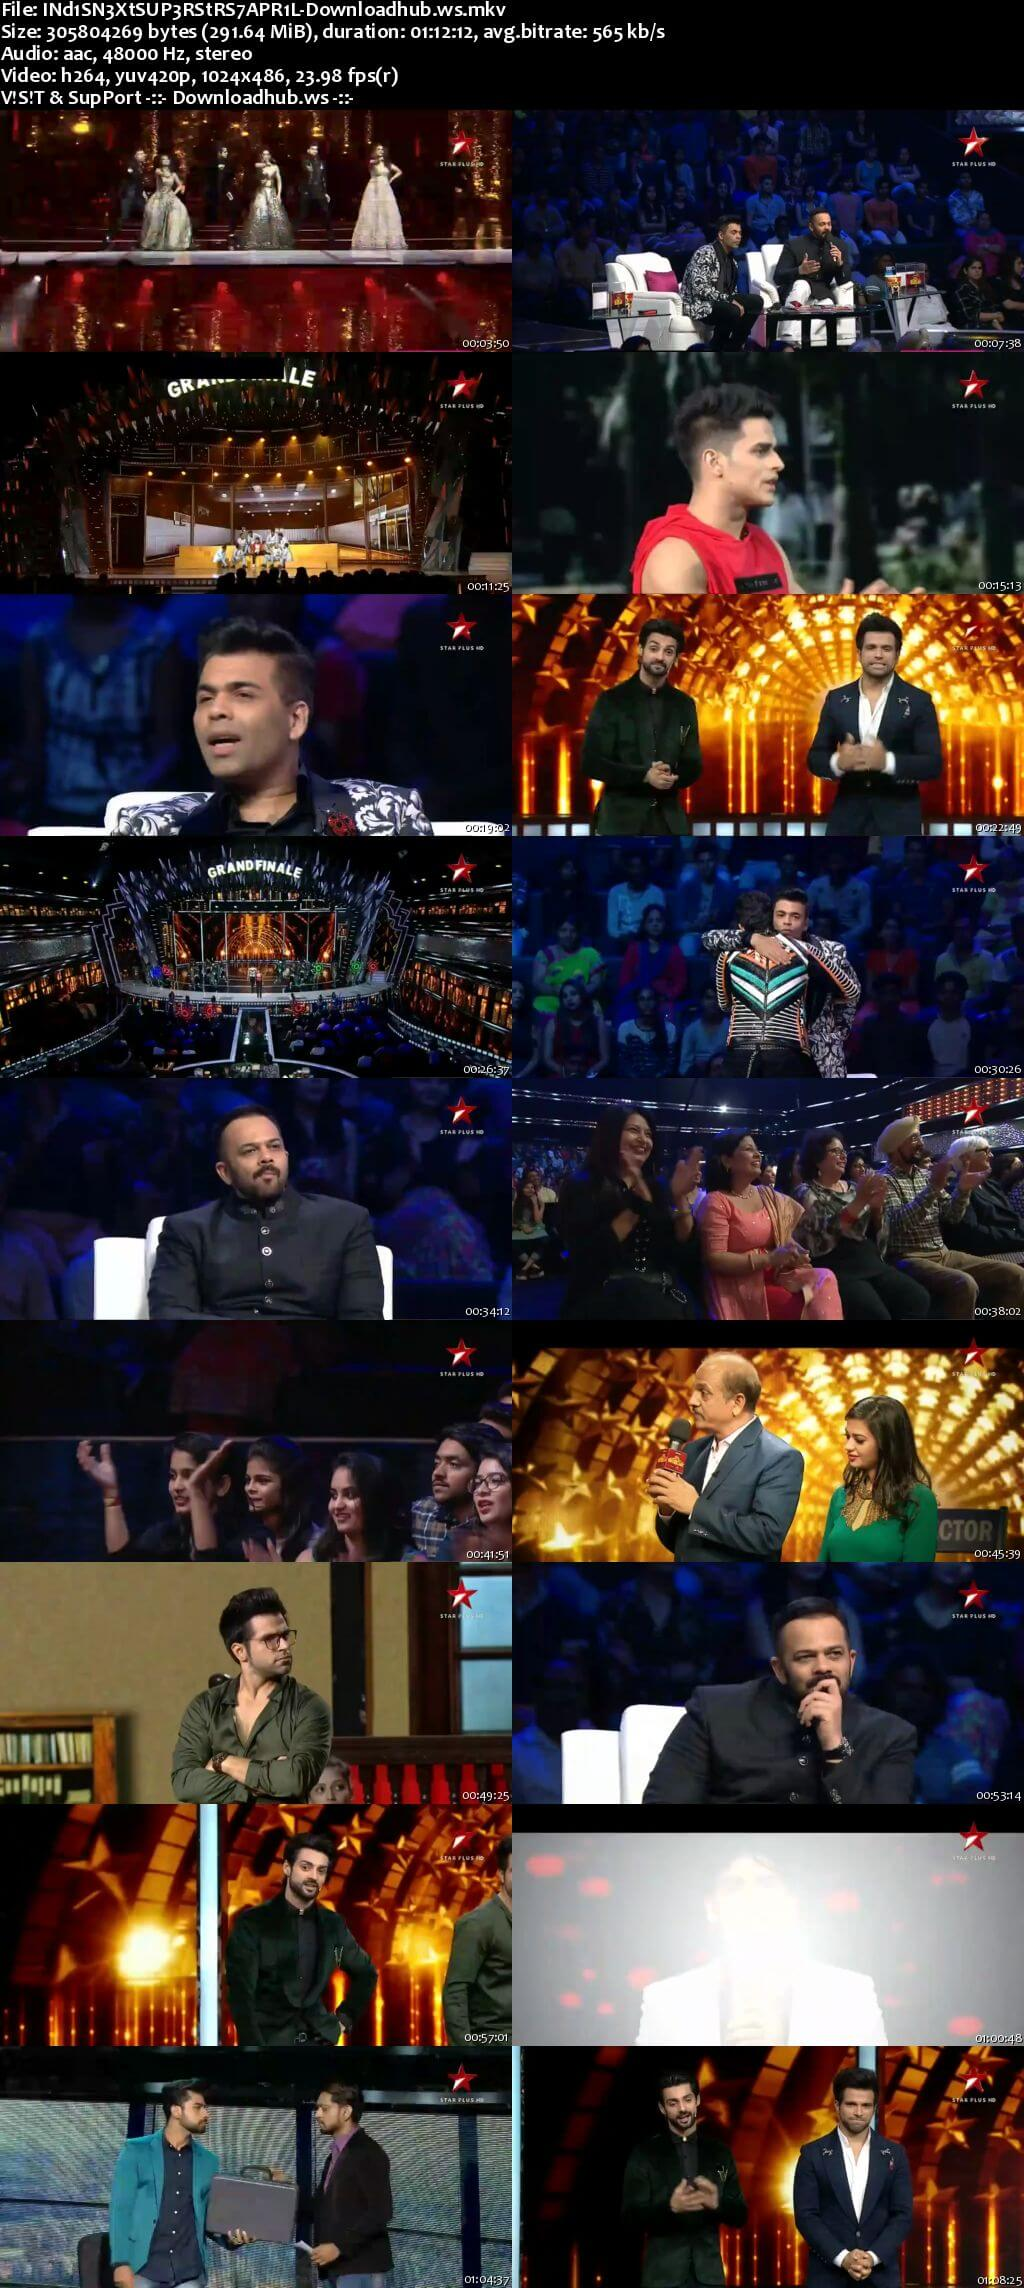 India's Next Superstars 07 April 2018 Grand Finals Episode HDTV 480p